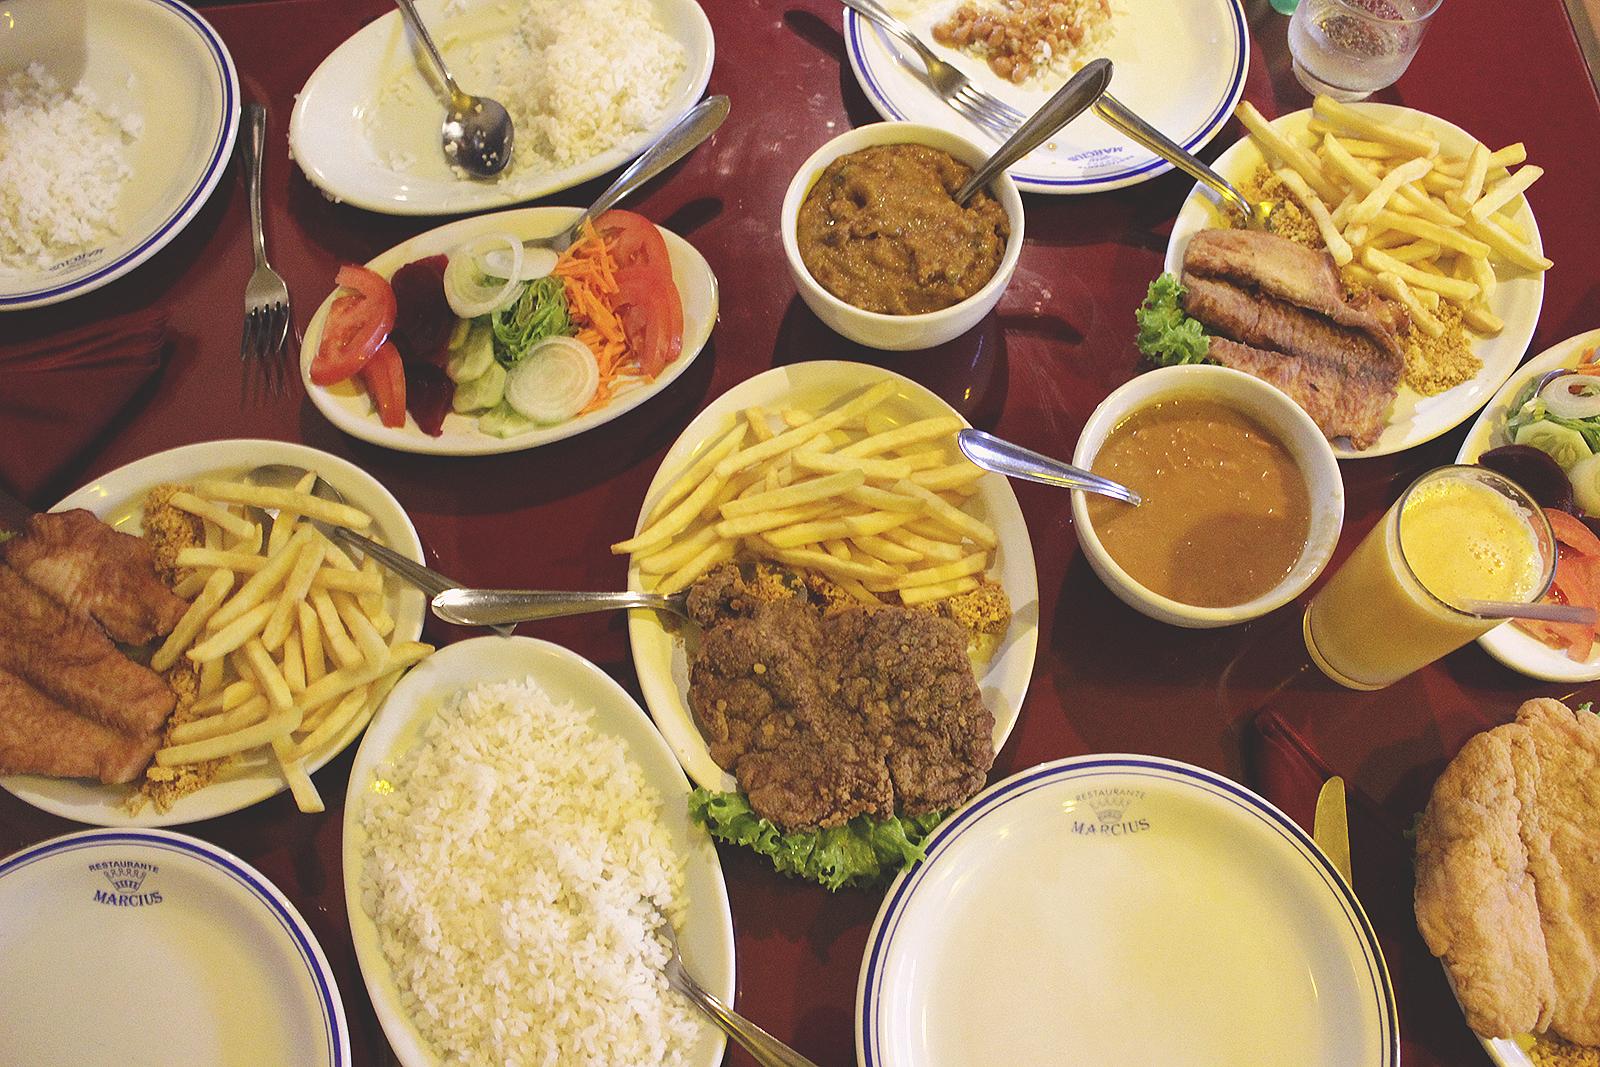 restaurante mesa cheia comida simples brasileira